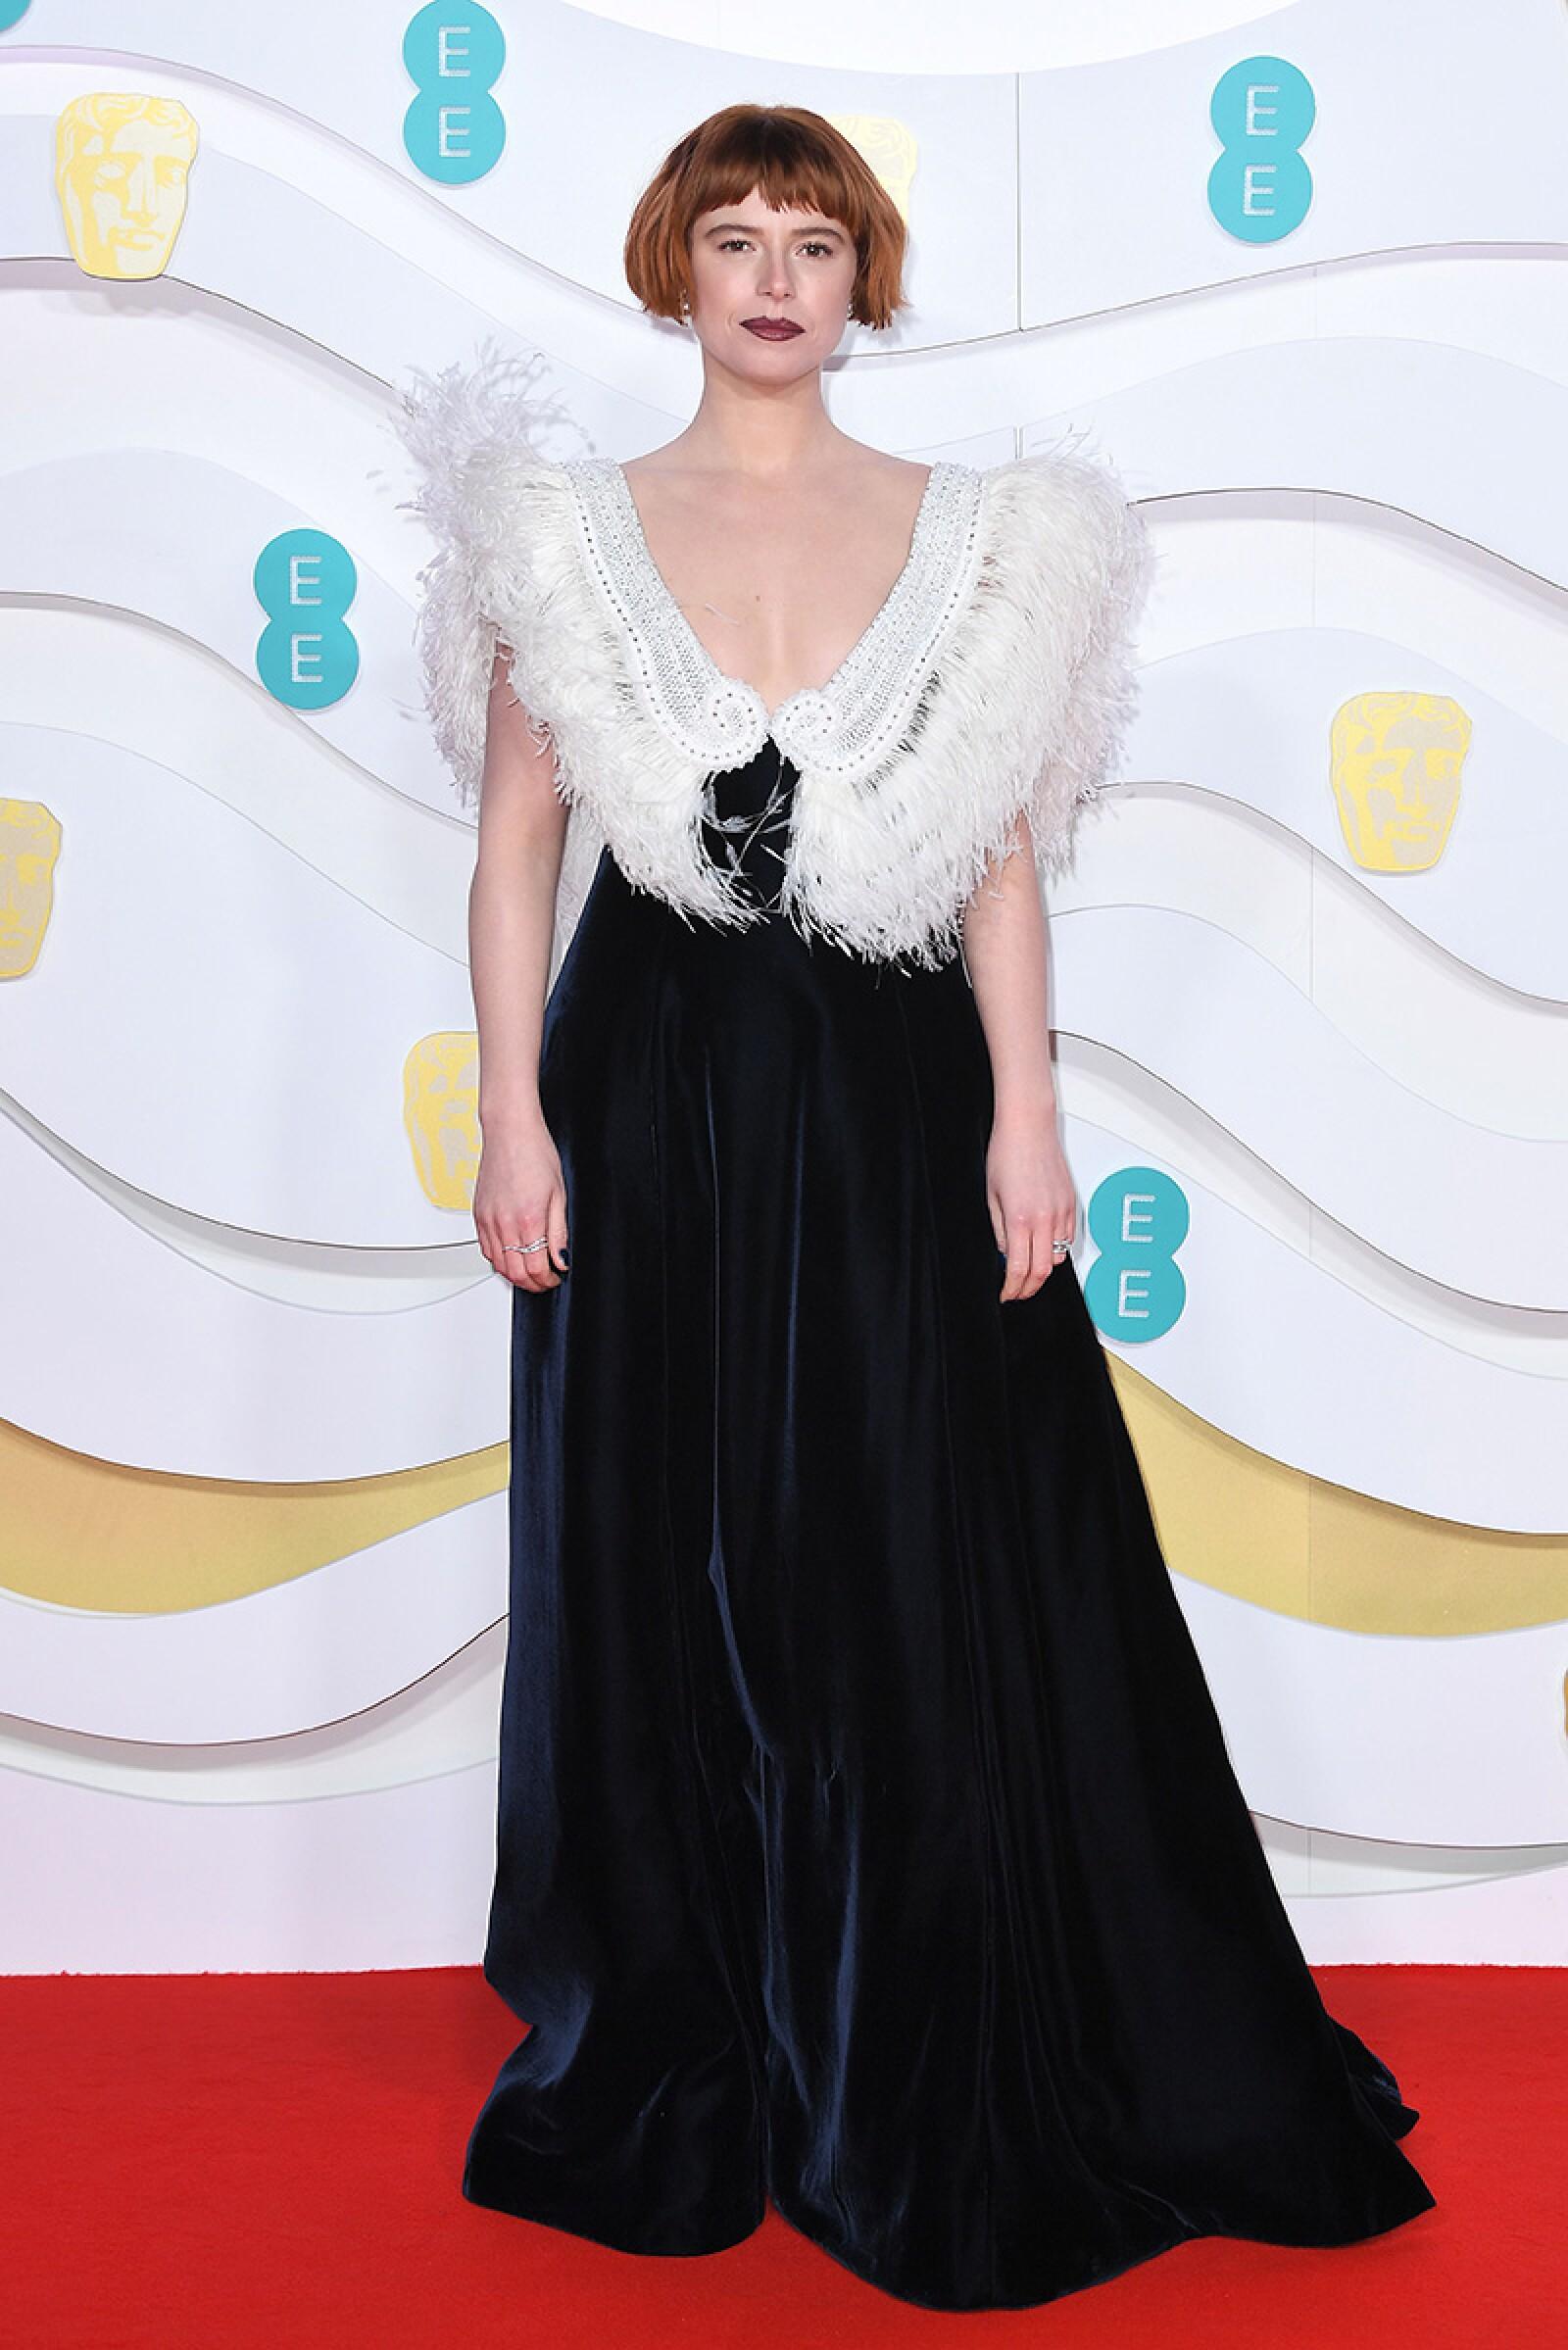 73rd British Academy Film Awards, VIP Arrivals, Royal Albert Hall, London, UK - 02 Feb 2020